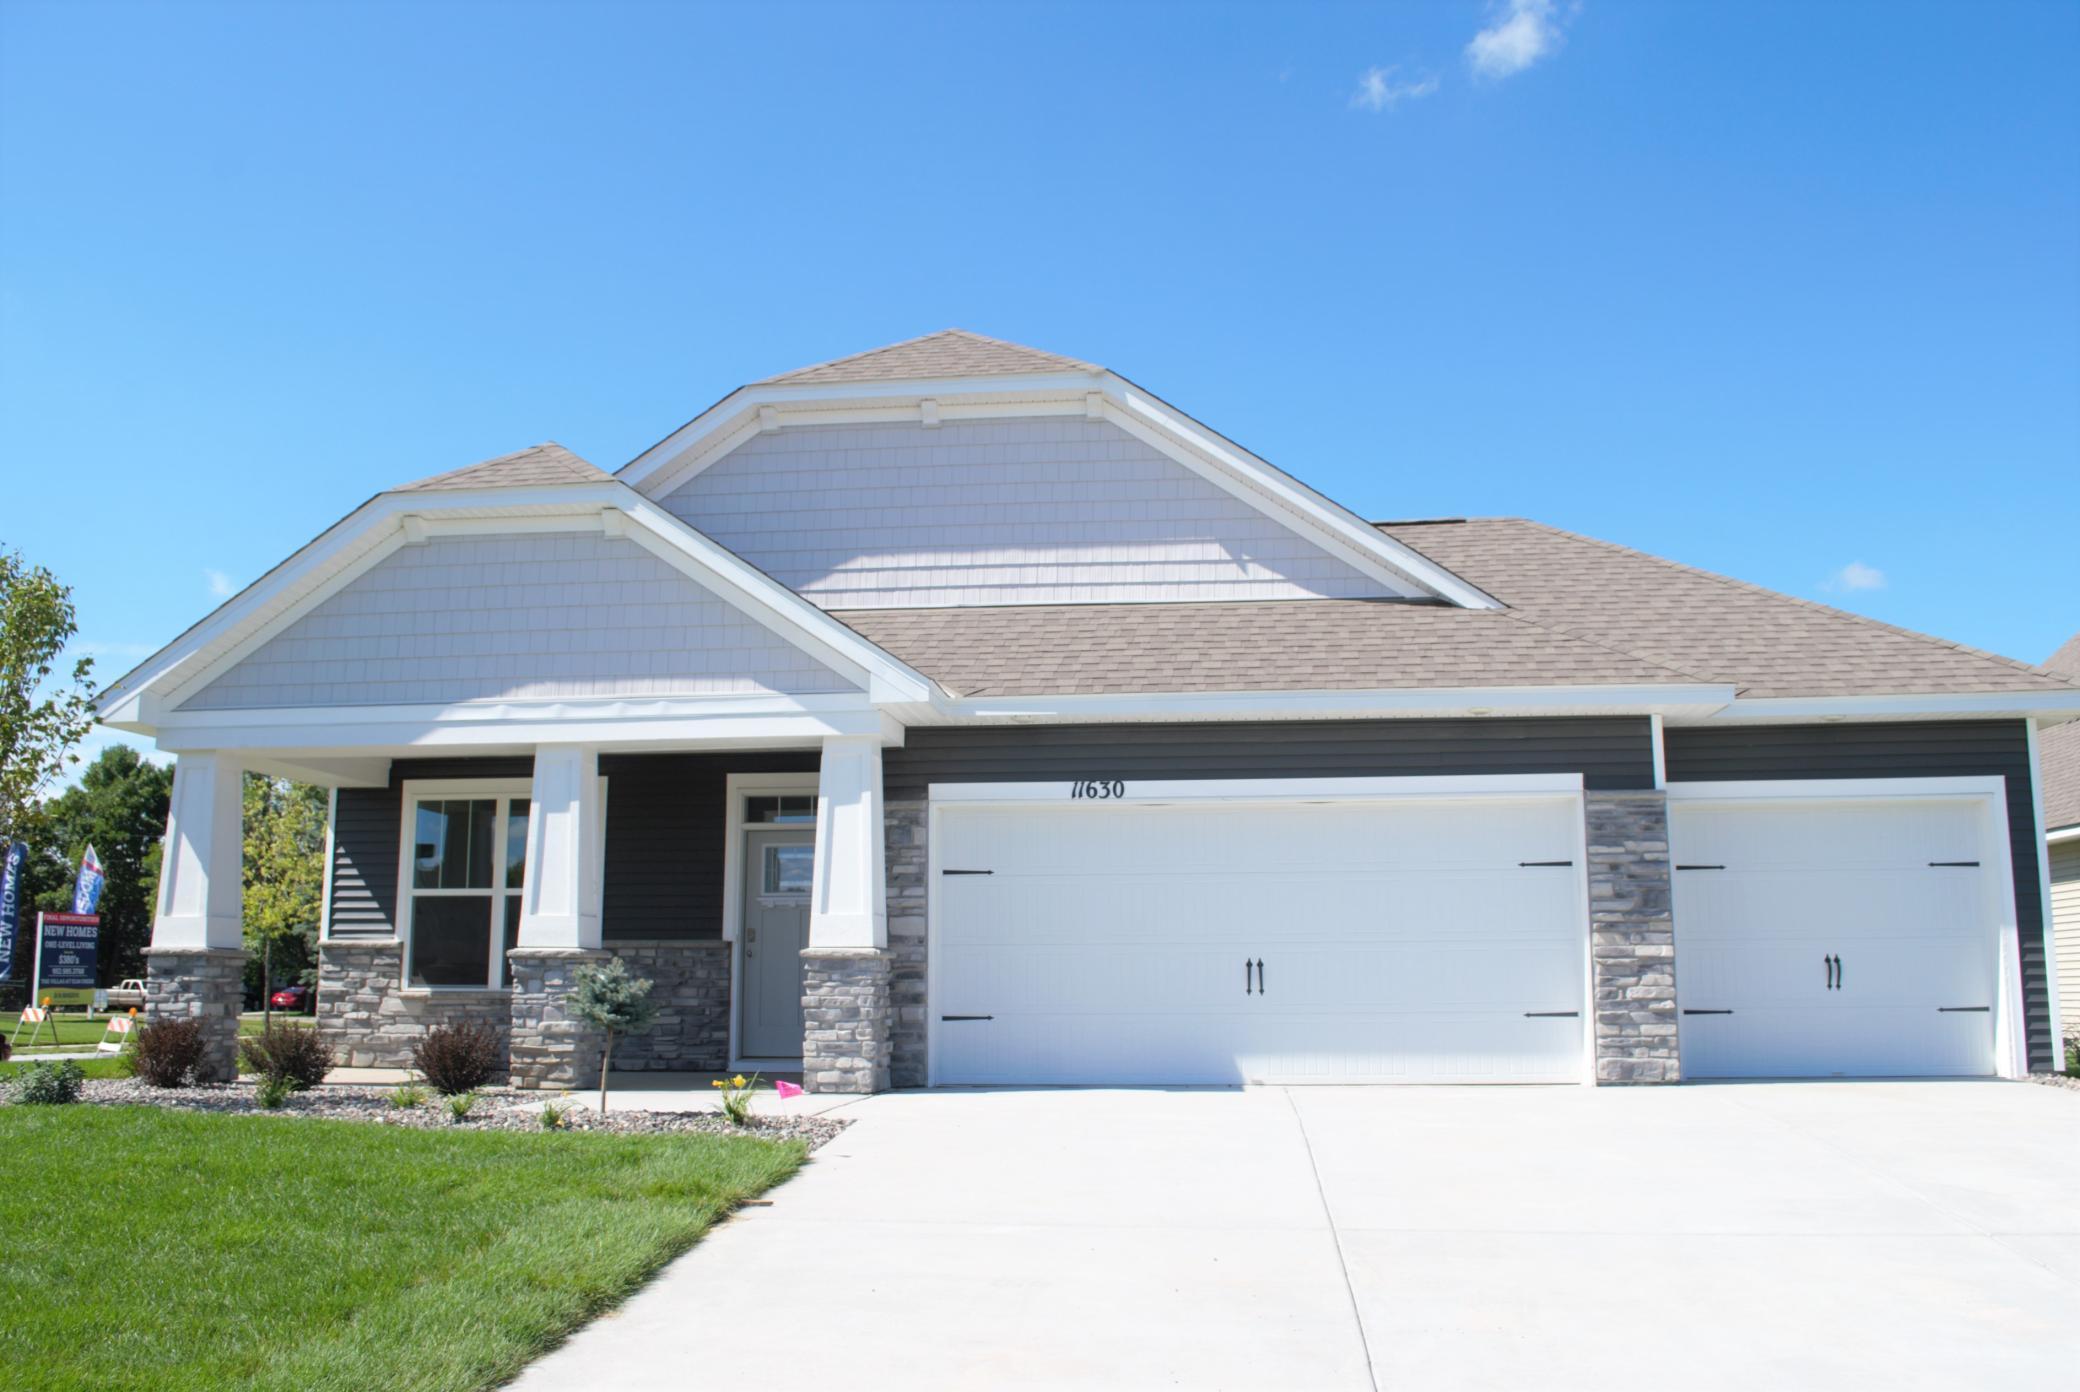 11630 Parkside Lane N Property Photo - Champlin, MN real estate listing